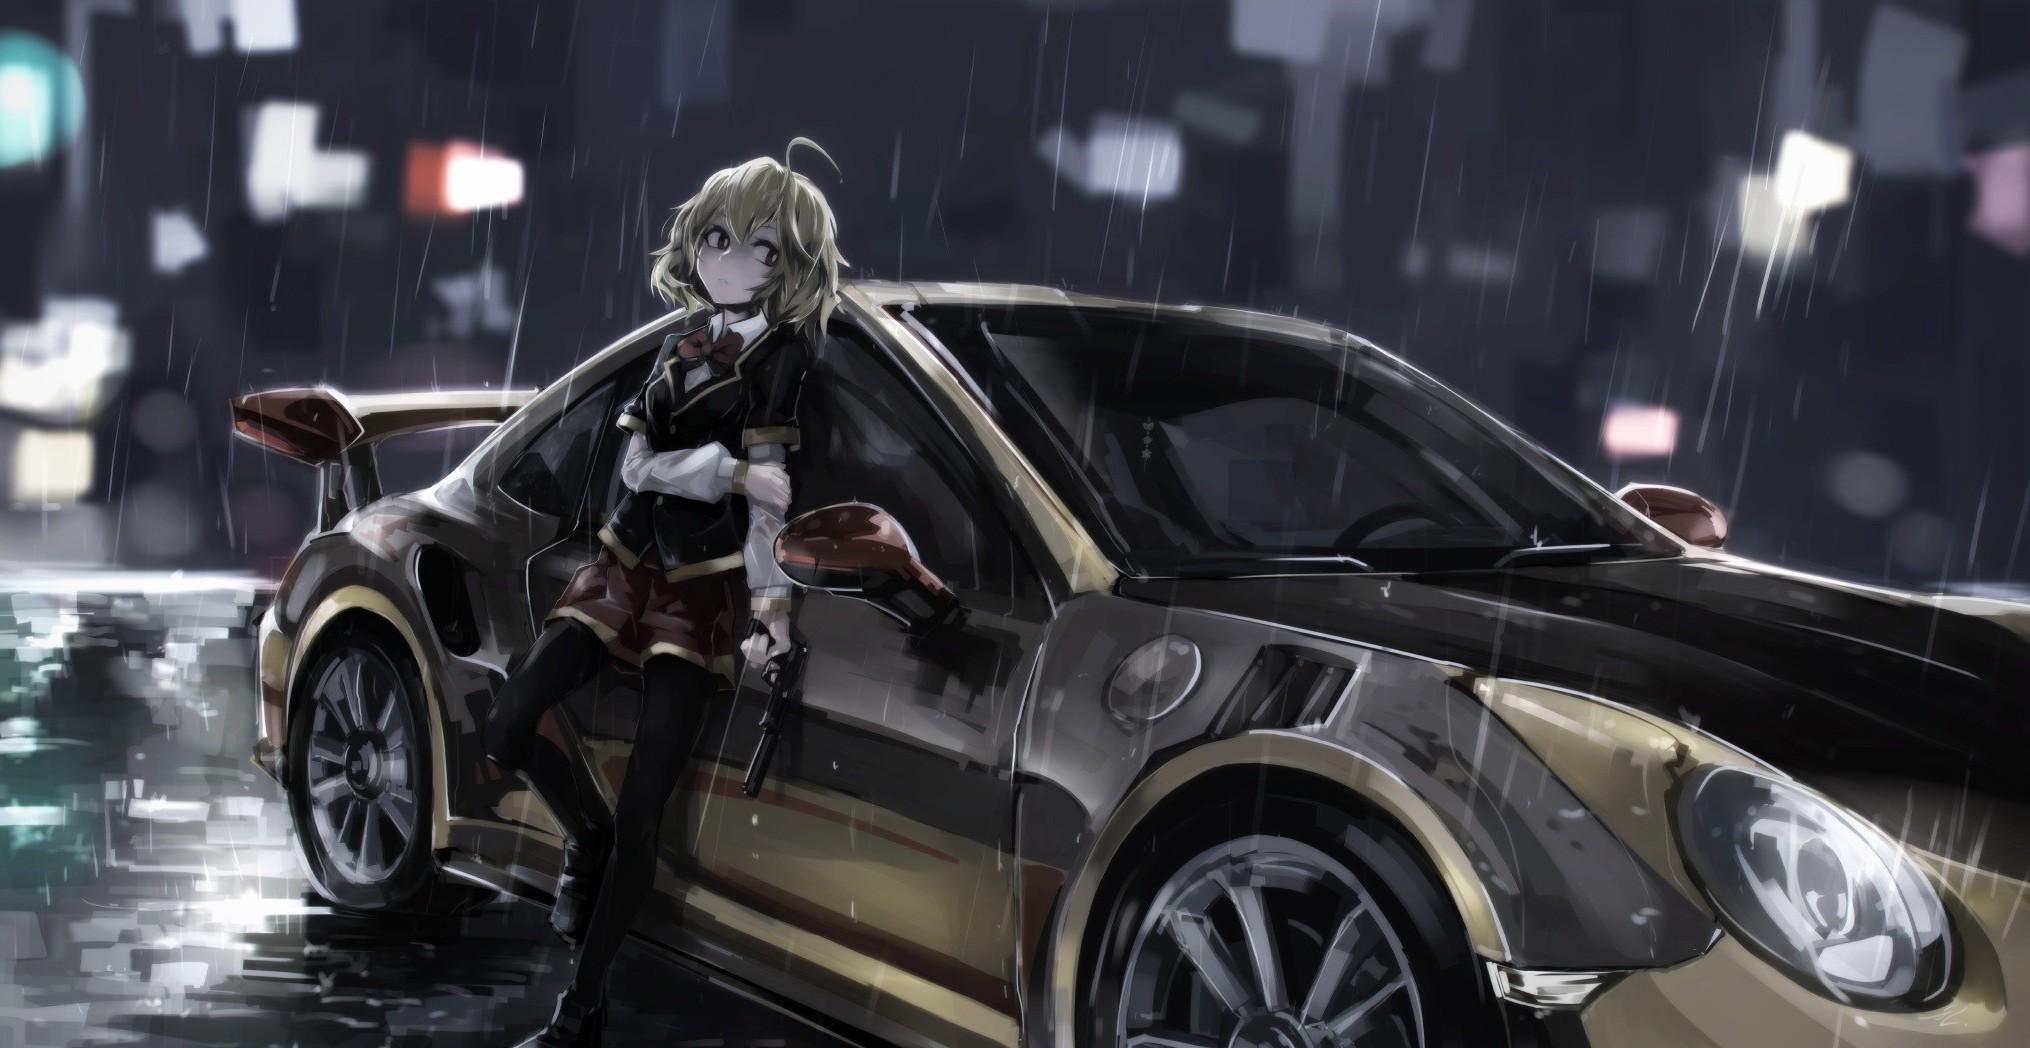 Cool Wallpaper Anime Car - anime-anime-girls-car-vehicle-Porsche-sports-car-Hashiri-Nio-Akuma-no-Riddle-wheel-supercar-land-vehicle-automotive-design-race-car-automobile-make-luxury-vehicle-auto-show-2030x1048-px-608174  Gallery_739616      .jpg